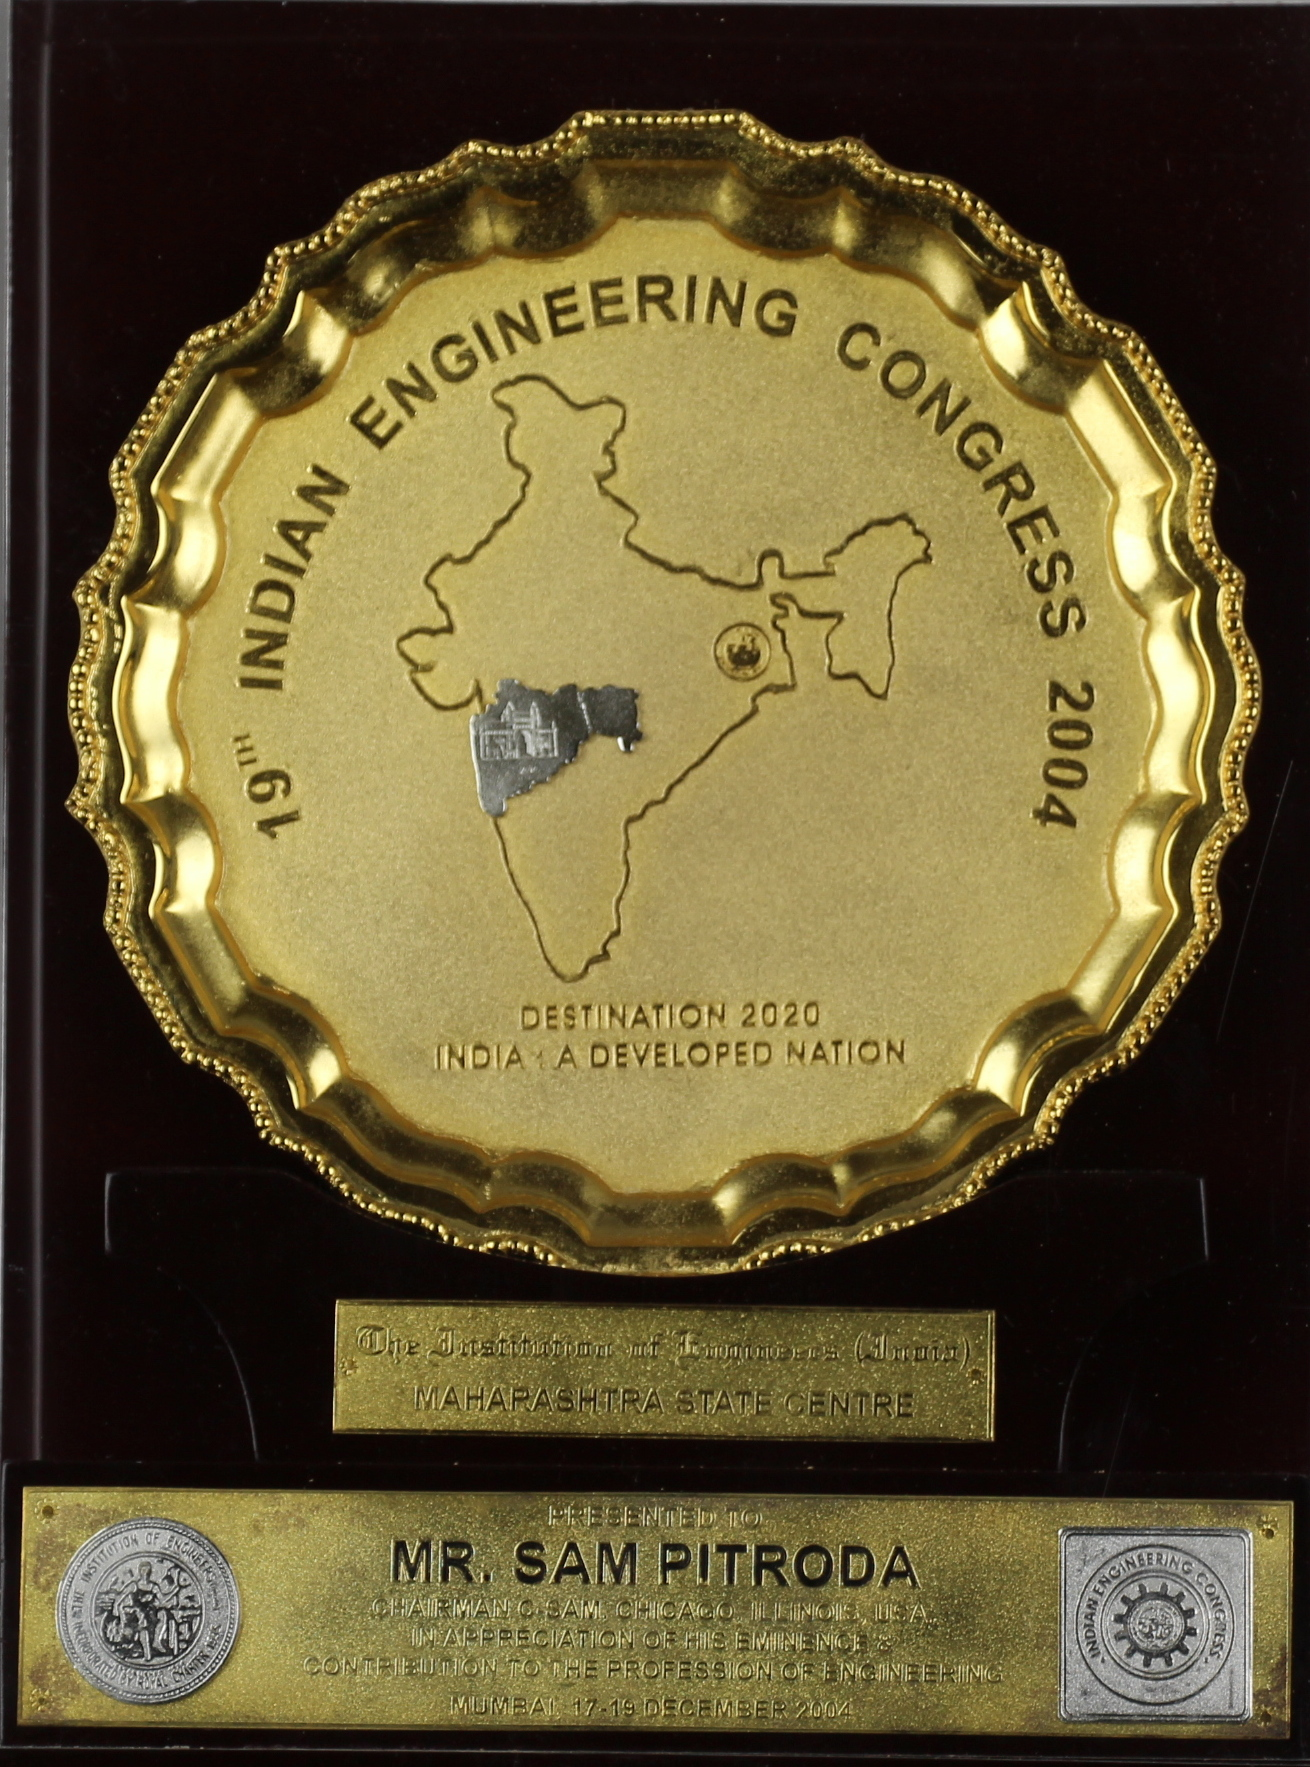 Award of Appreciation, 19th Indian Engineering Congress, 2004